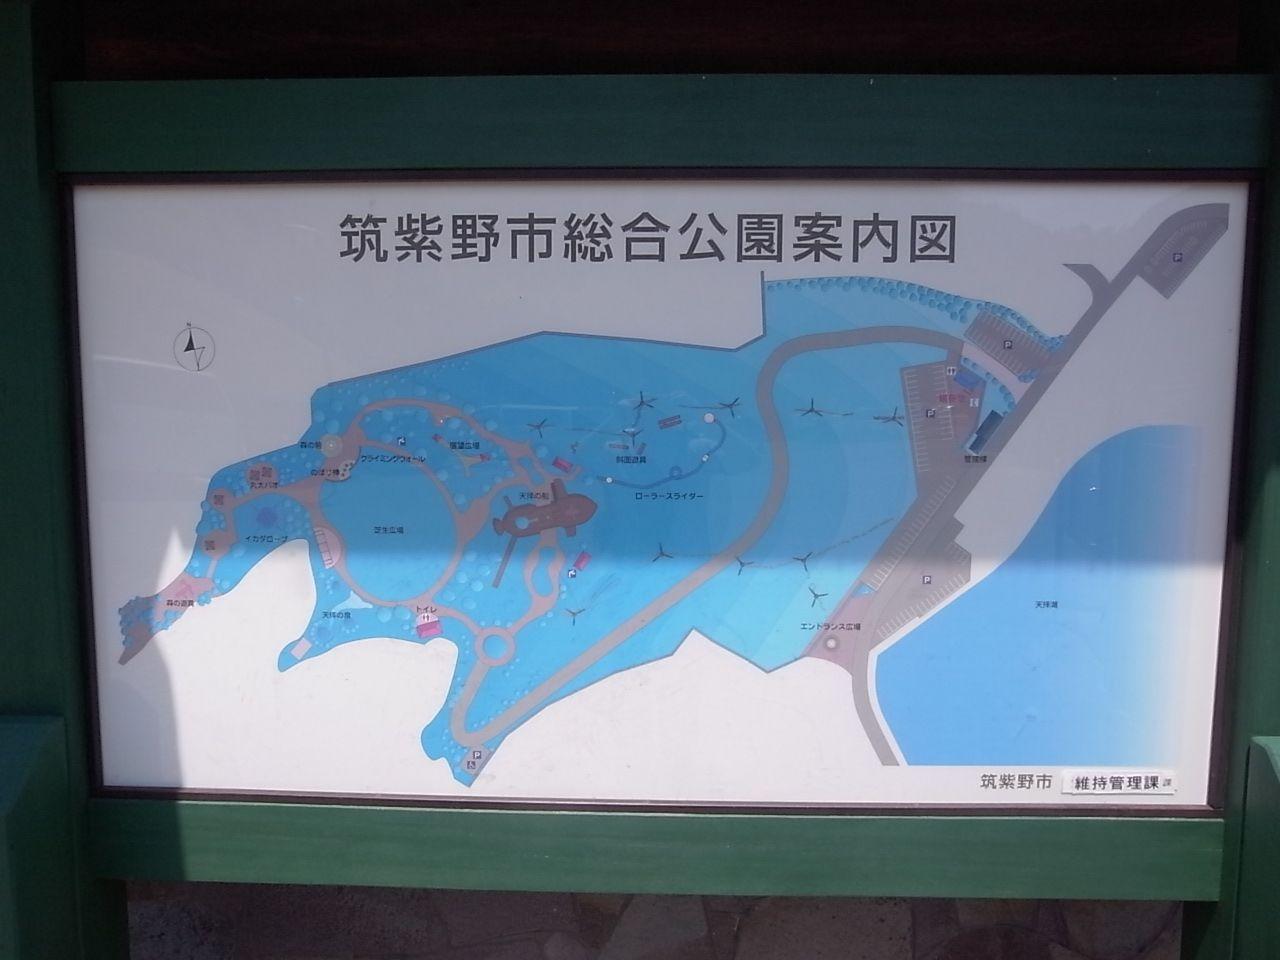 福岡の筑紫野市総合公園14